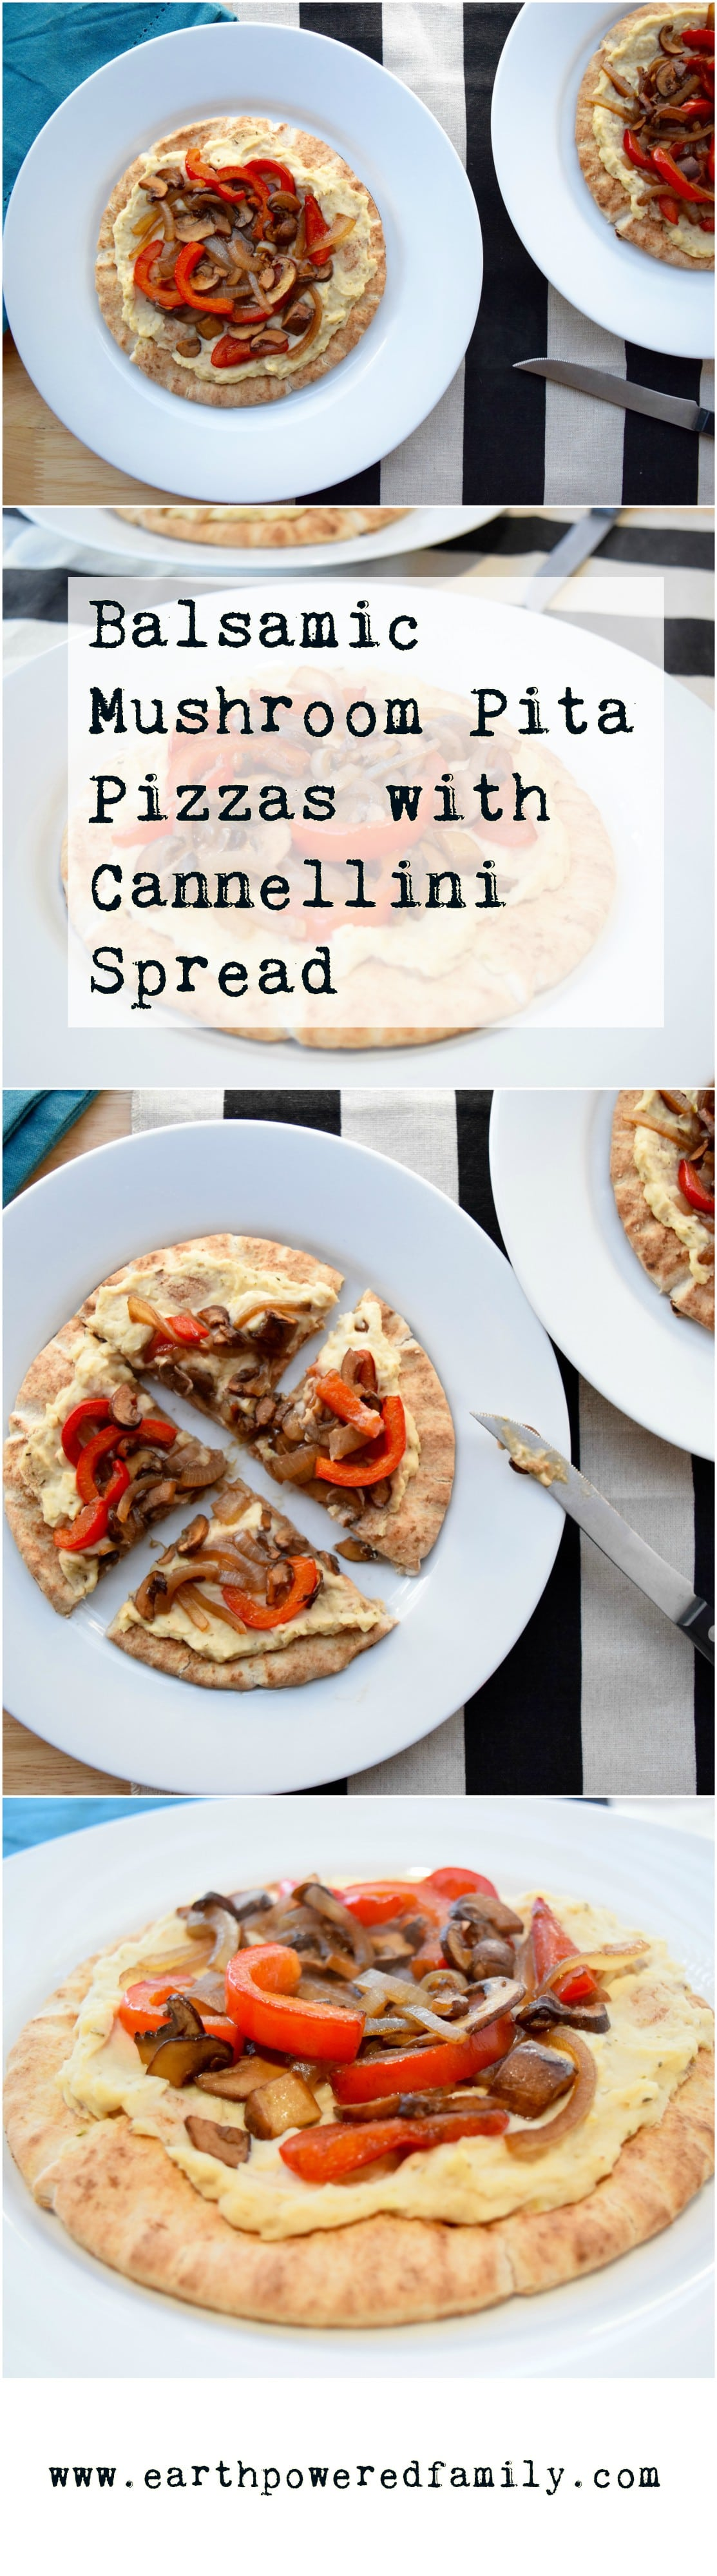 Balsamic Mushroom Pita Pizzas